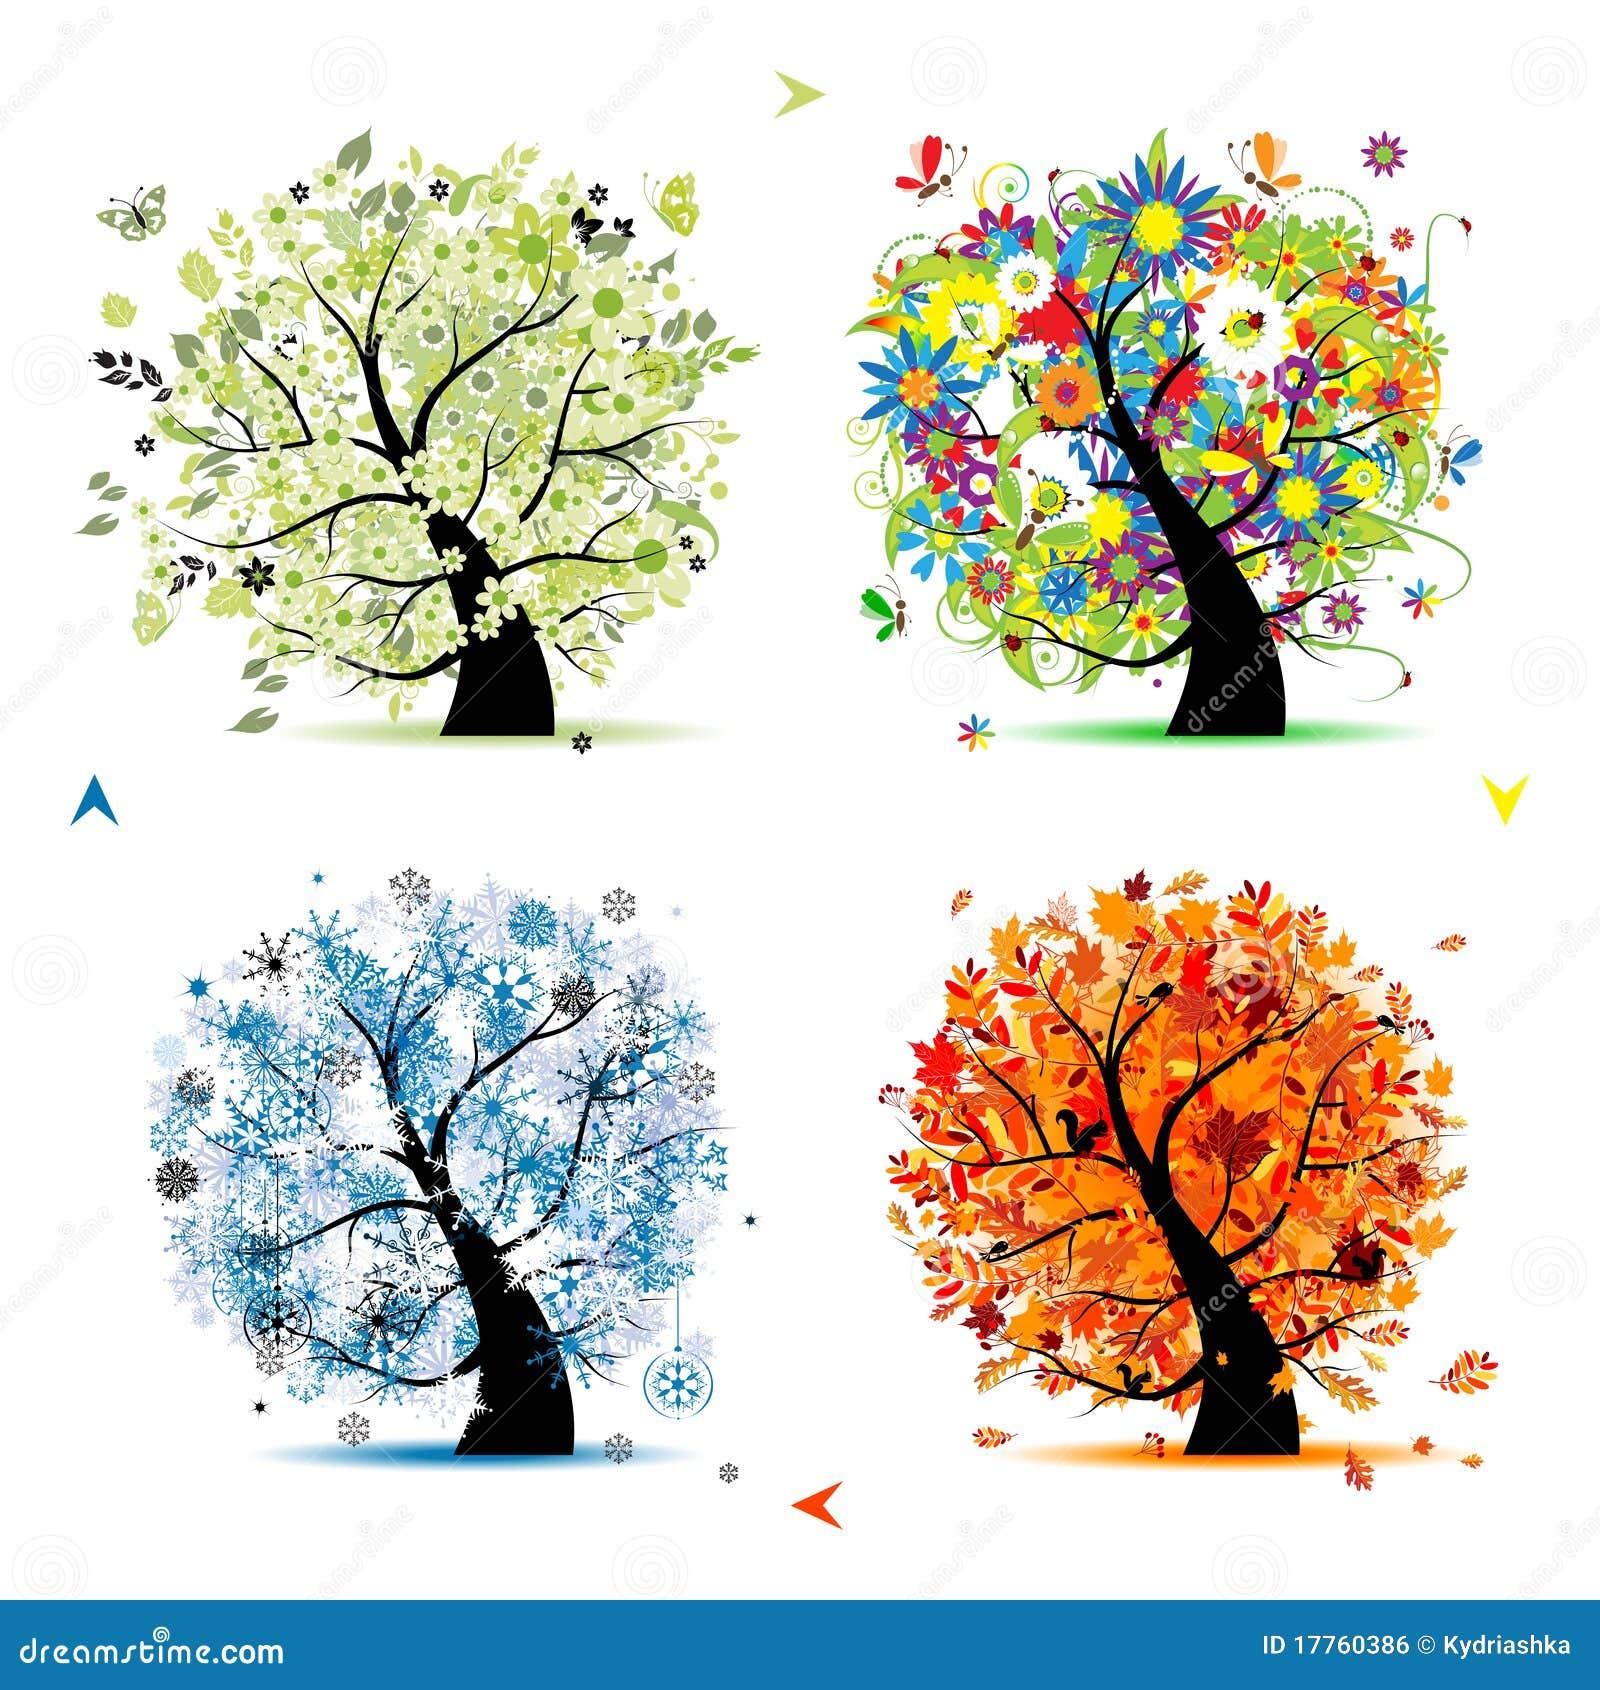 Four seasons-spring, summer, autumn, winter tree